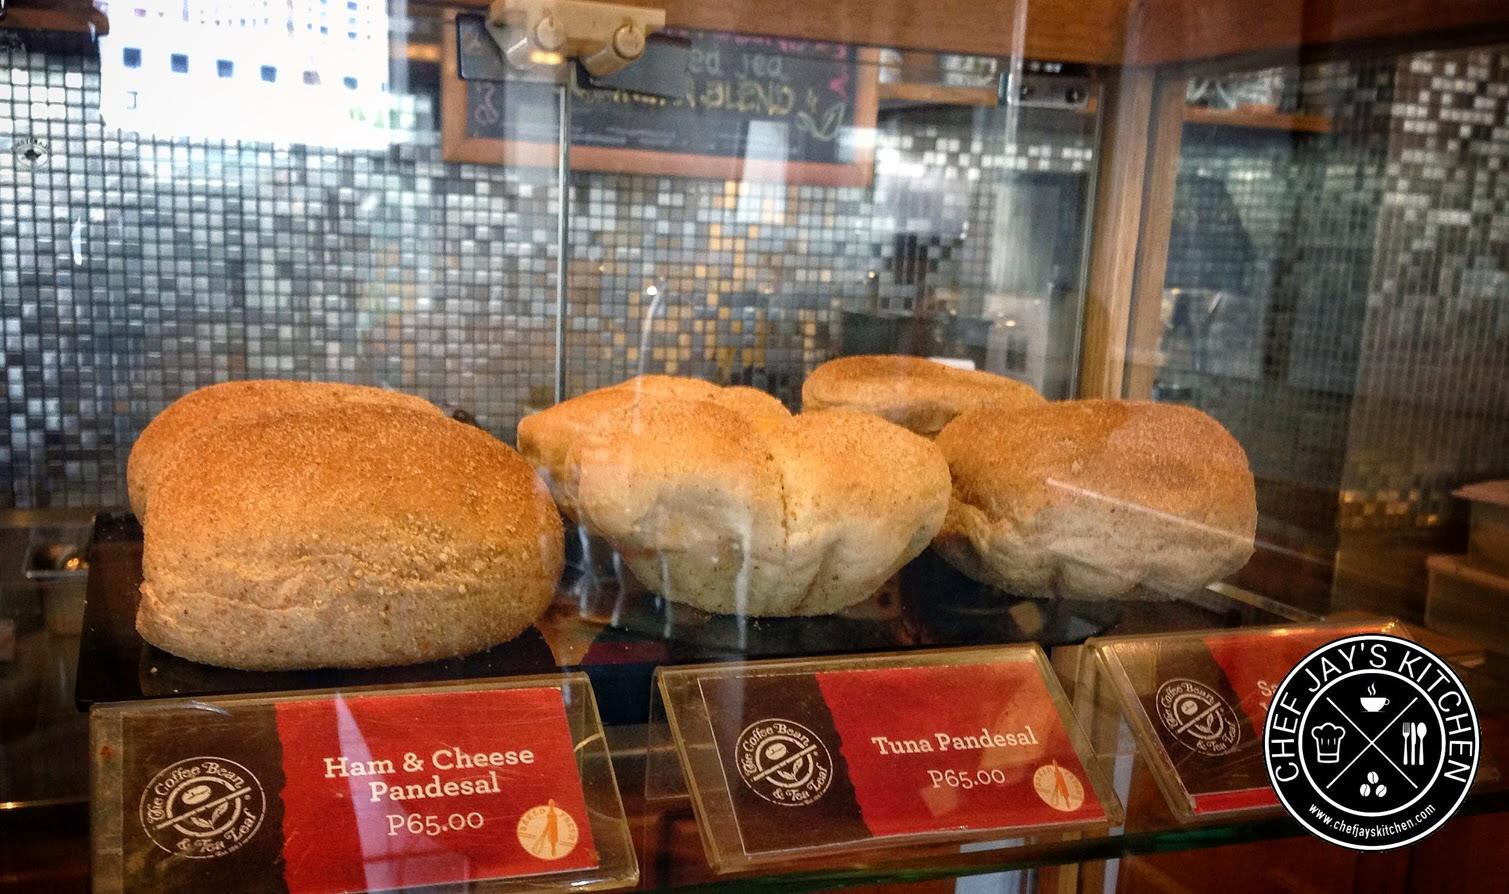 Coffee Bean & Tea Leaf Philippines - CBTL Tuna, Ham & Cheese Pandesal